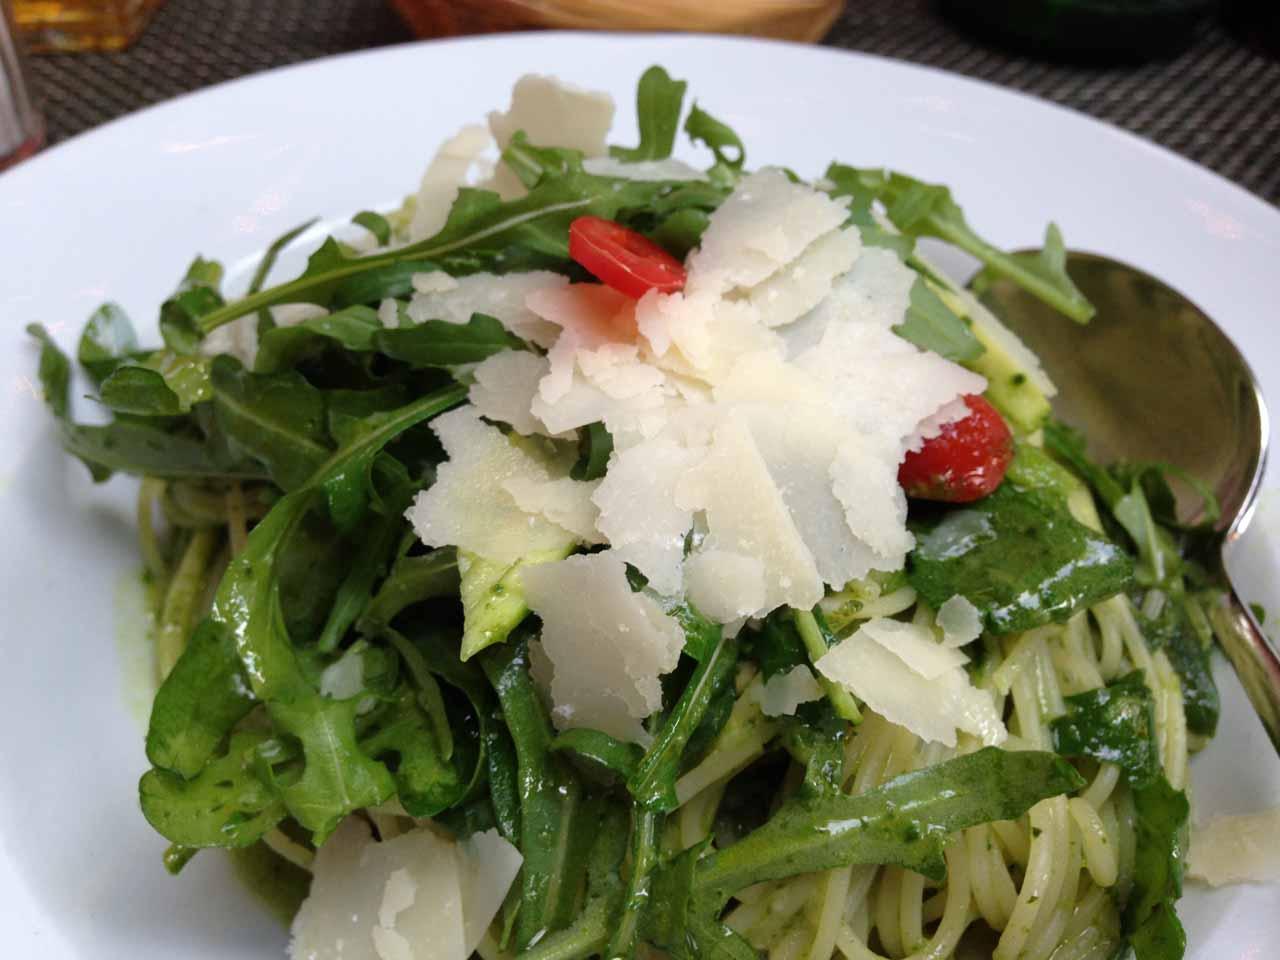 Julie's pesto pasta